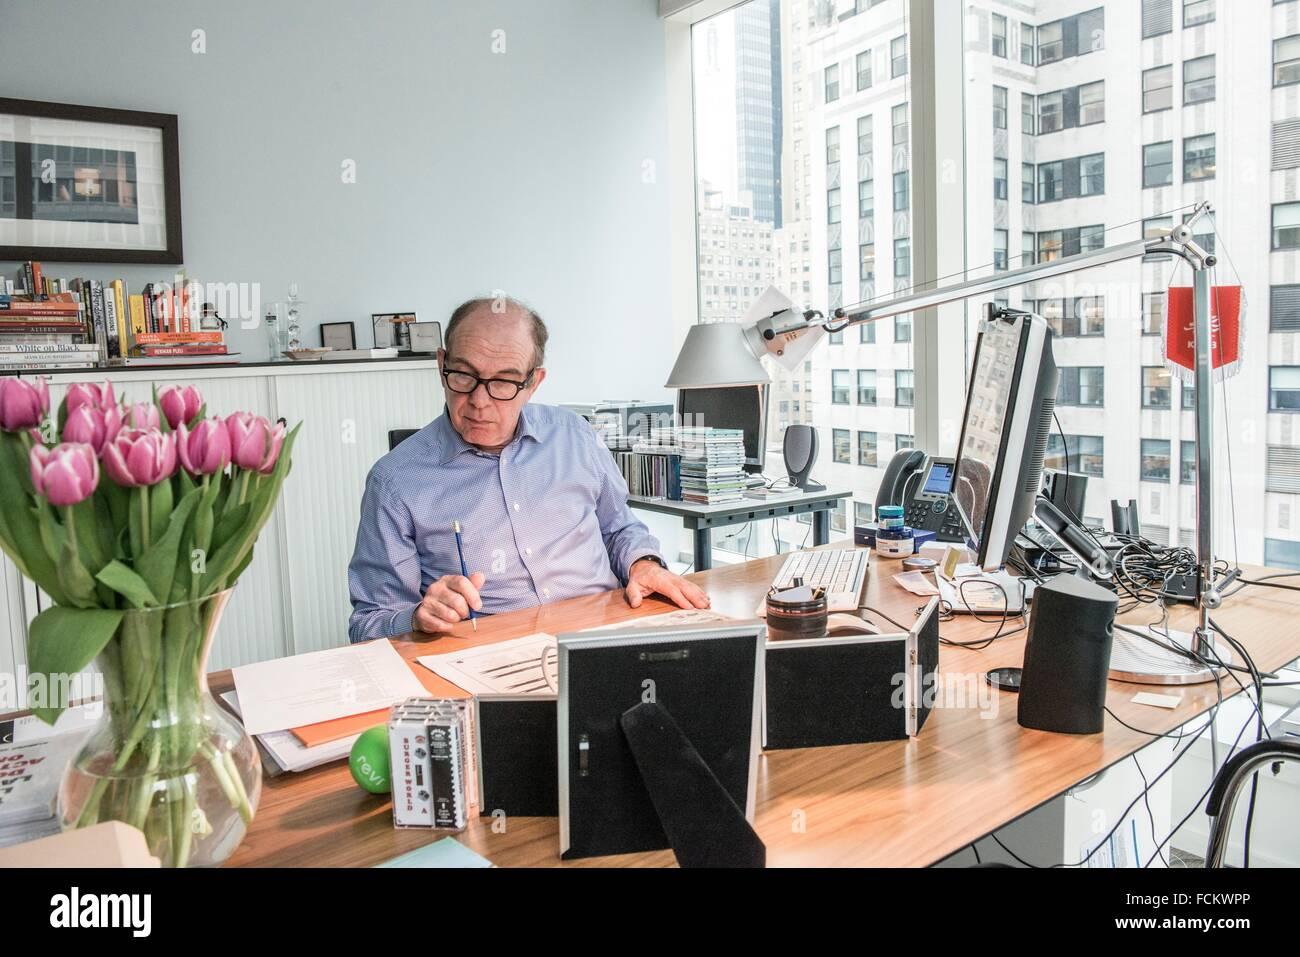 Meuble habufa mobilier de bureau en néerlandais bureau anglais